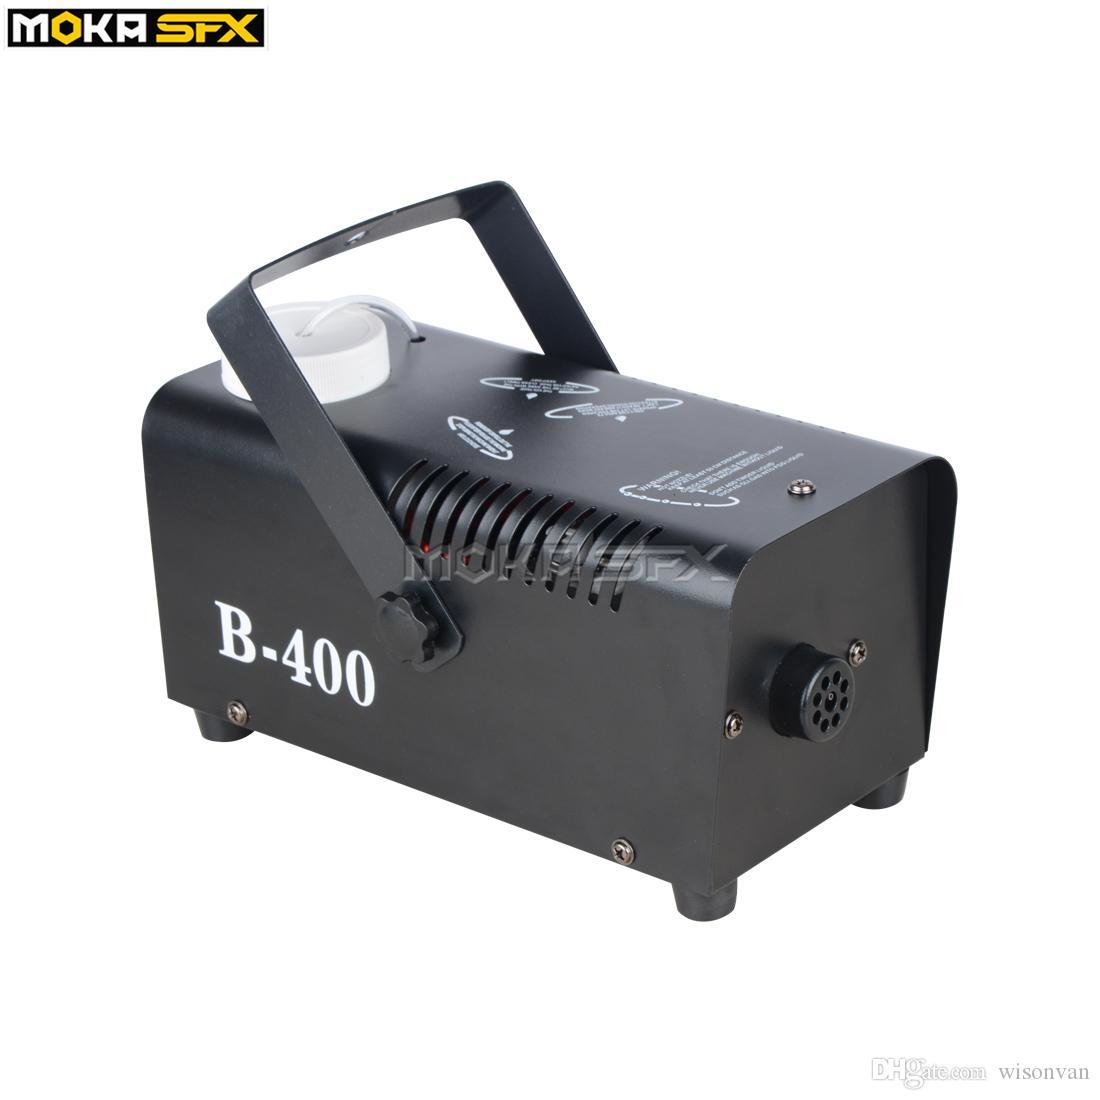 Moka MK-F09 400 Watt Fog Smoke Machine Pro DJ for Stage Club Party Pub Special Effect